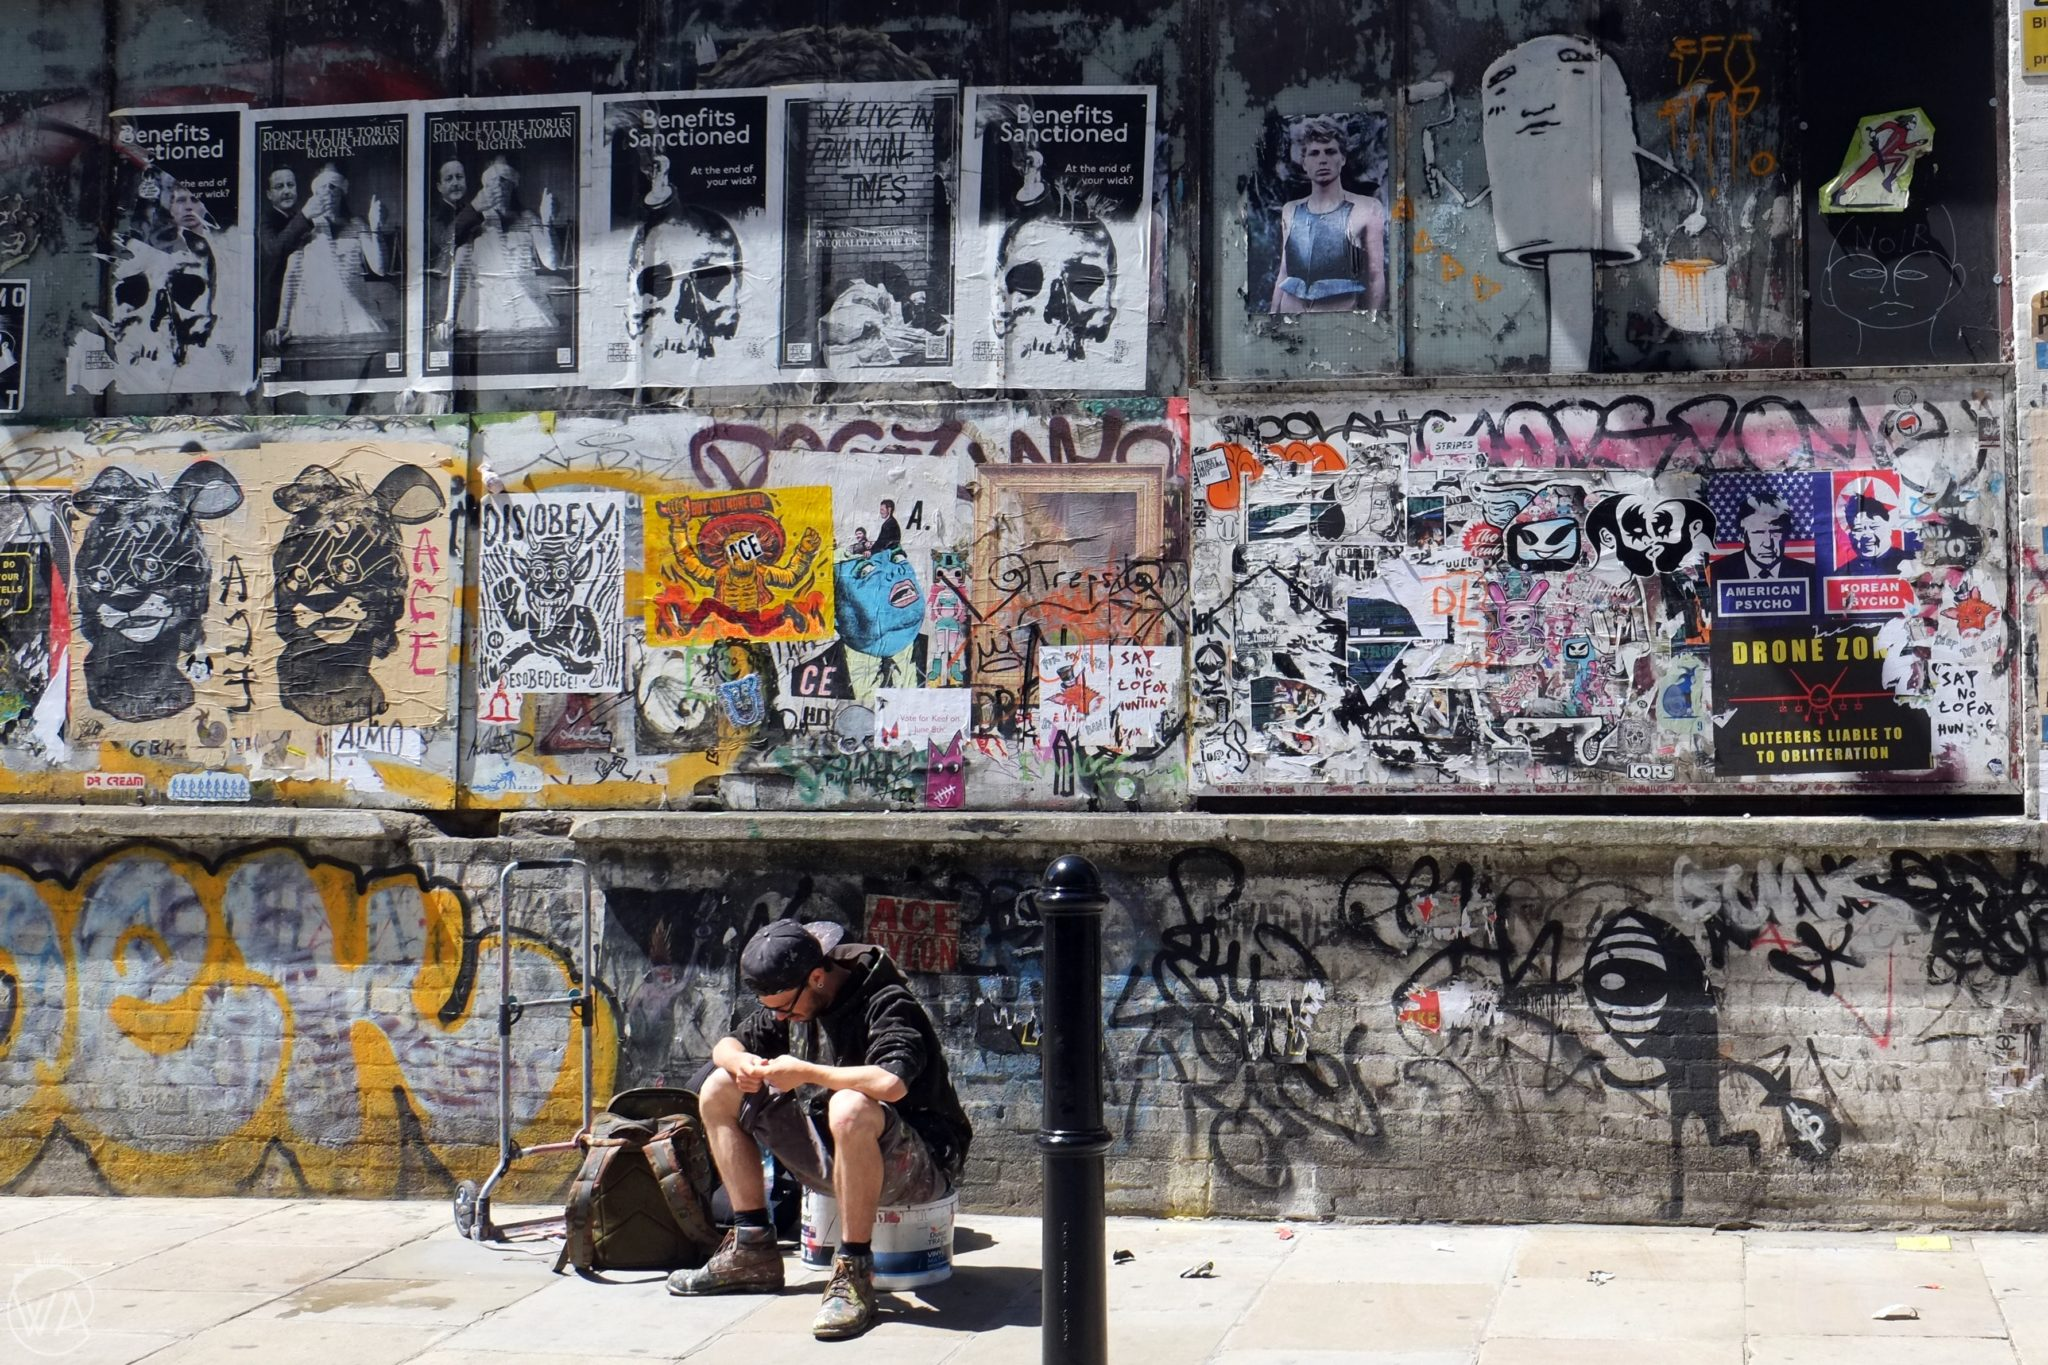 Graffiti artist in East End London Brick lane